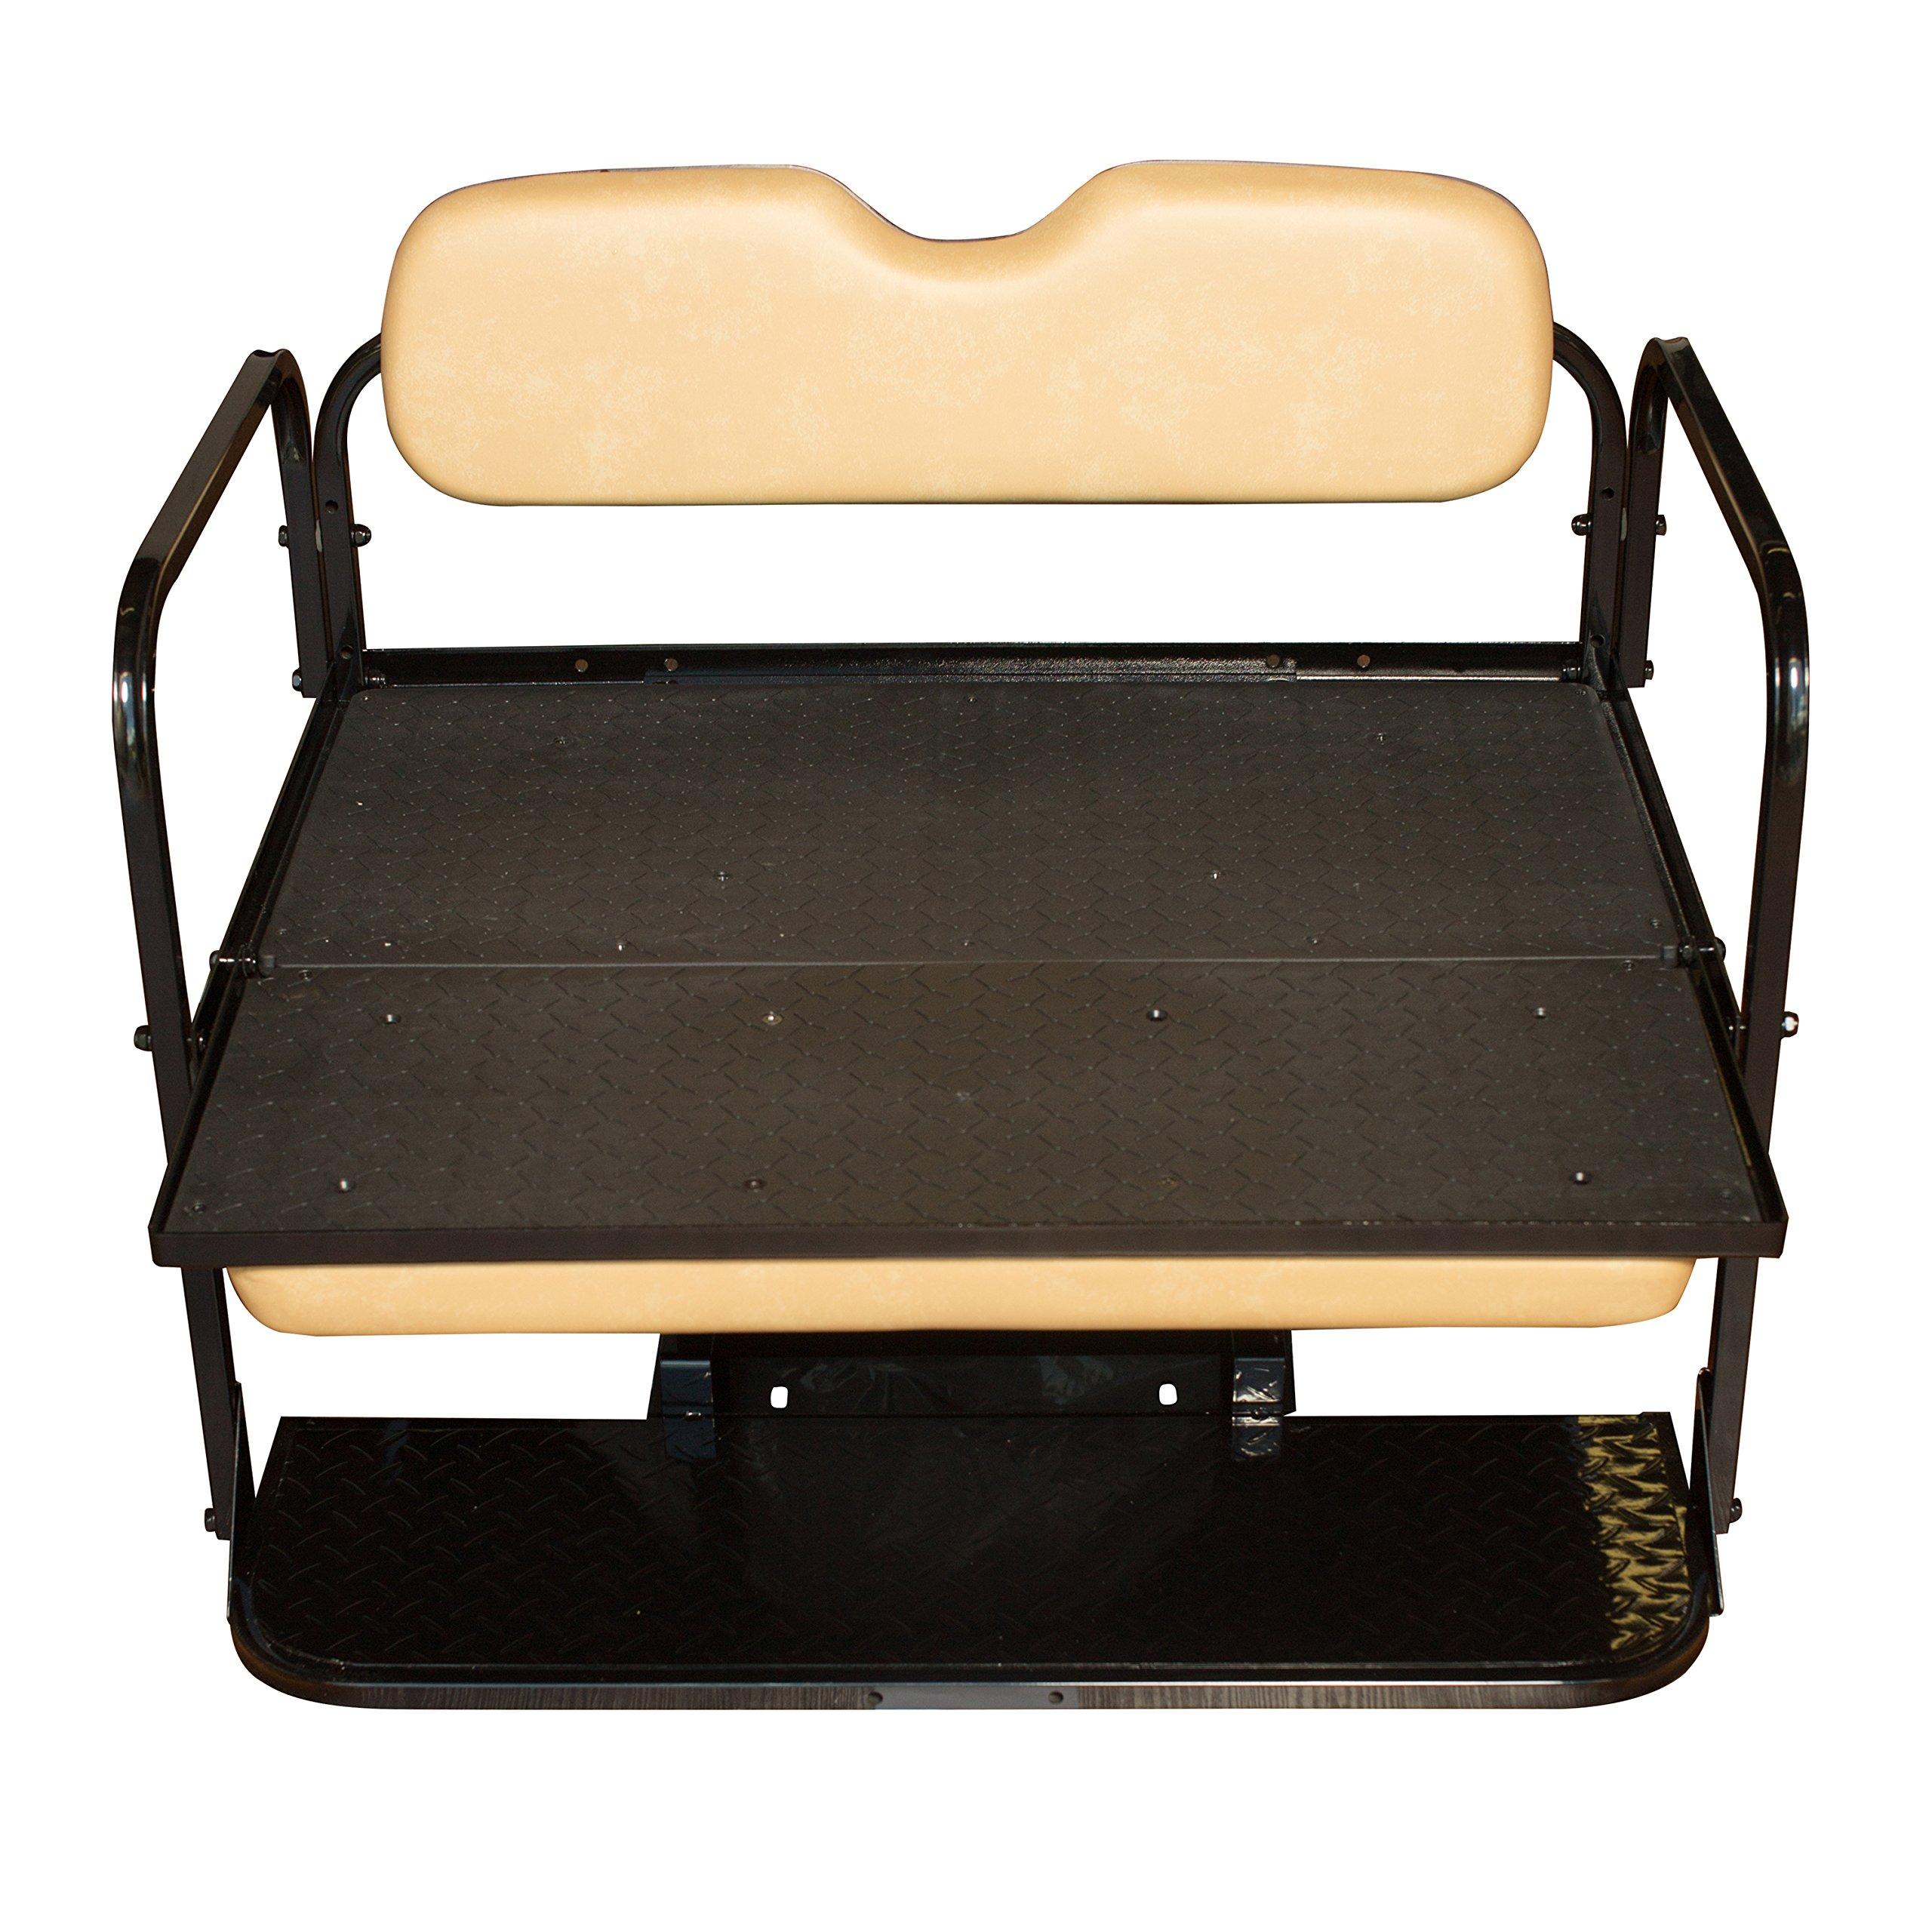 Golf Cart Rear Seat EZ-GO TXT Tan Cushions by Performance Plus Carts (Image #3)